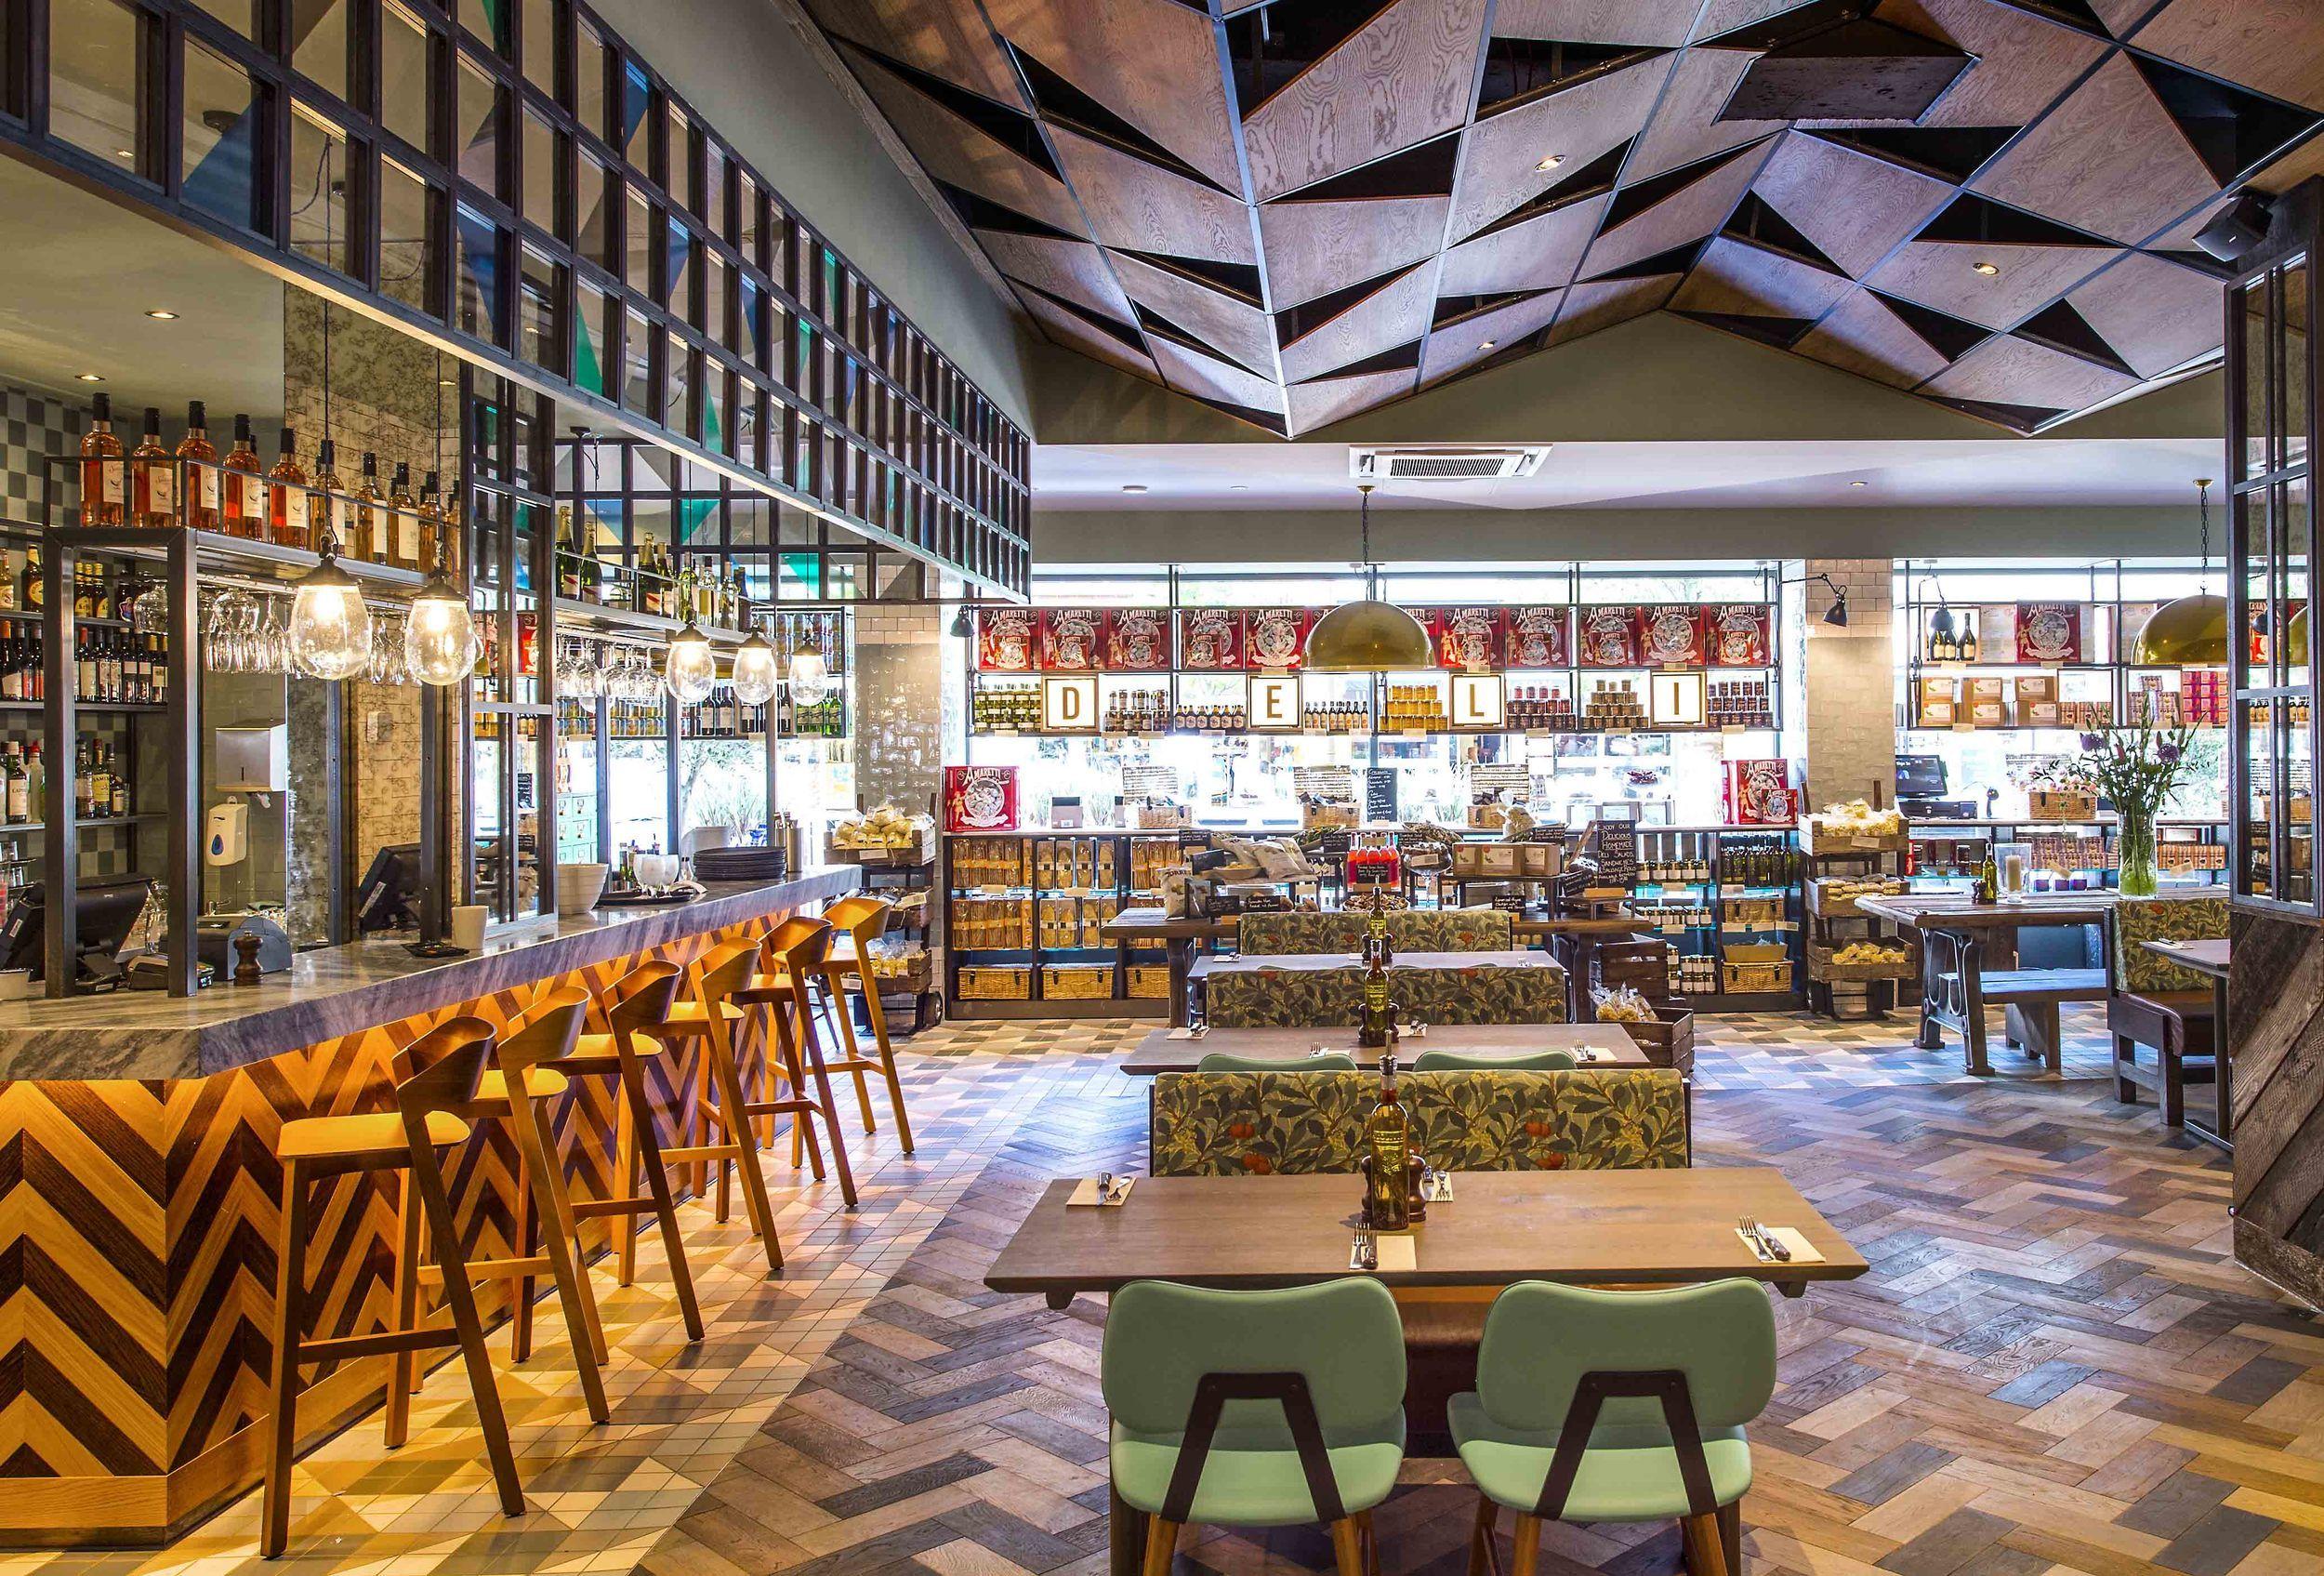 Design Command Restaurant Wildwood Llandudno 2016 Wildwood